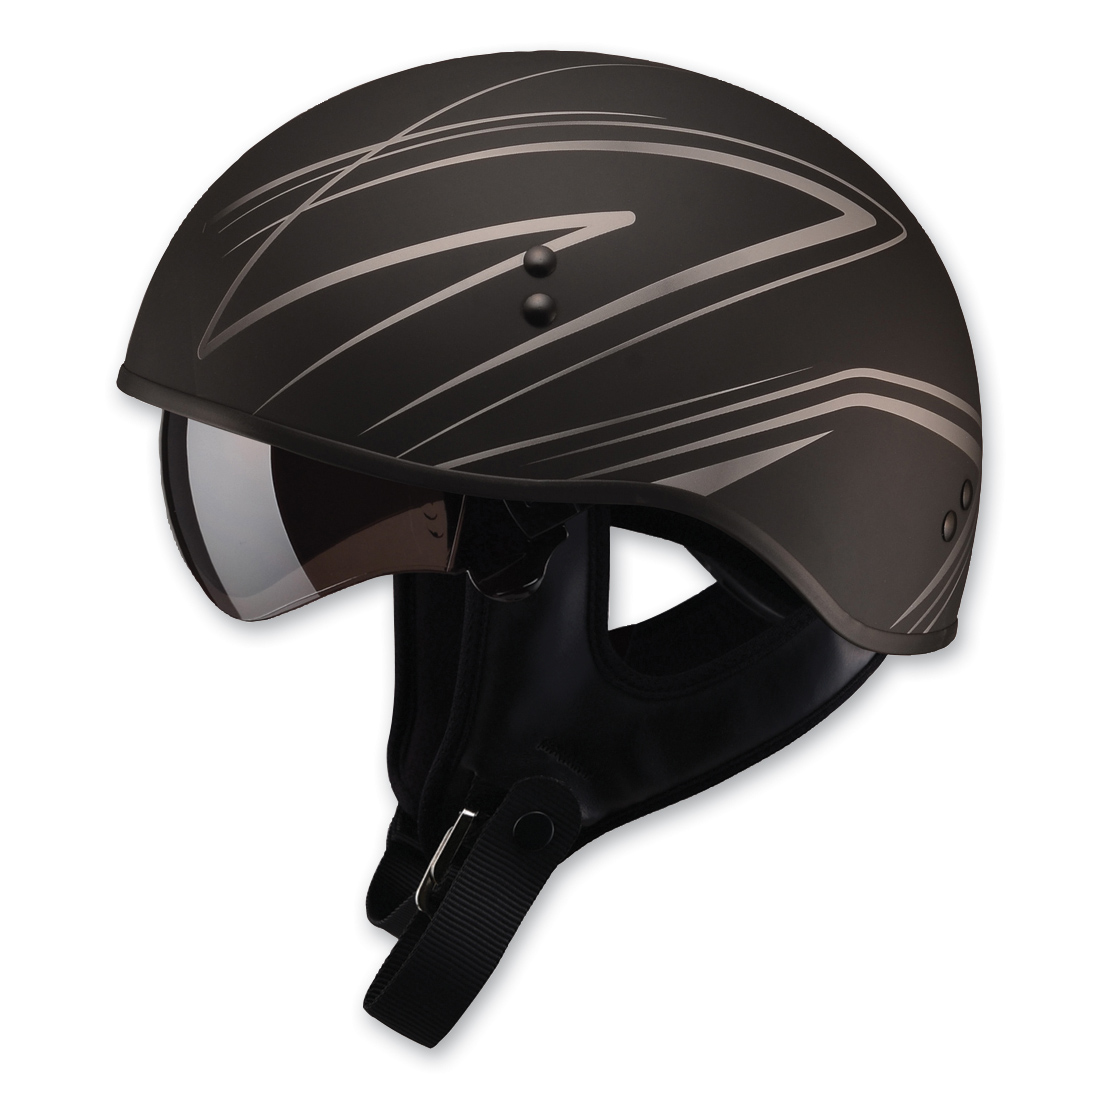 GMAX GM65 Naked Torque Flat Black/Silver Half Helmet